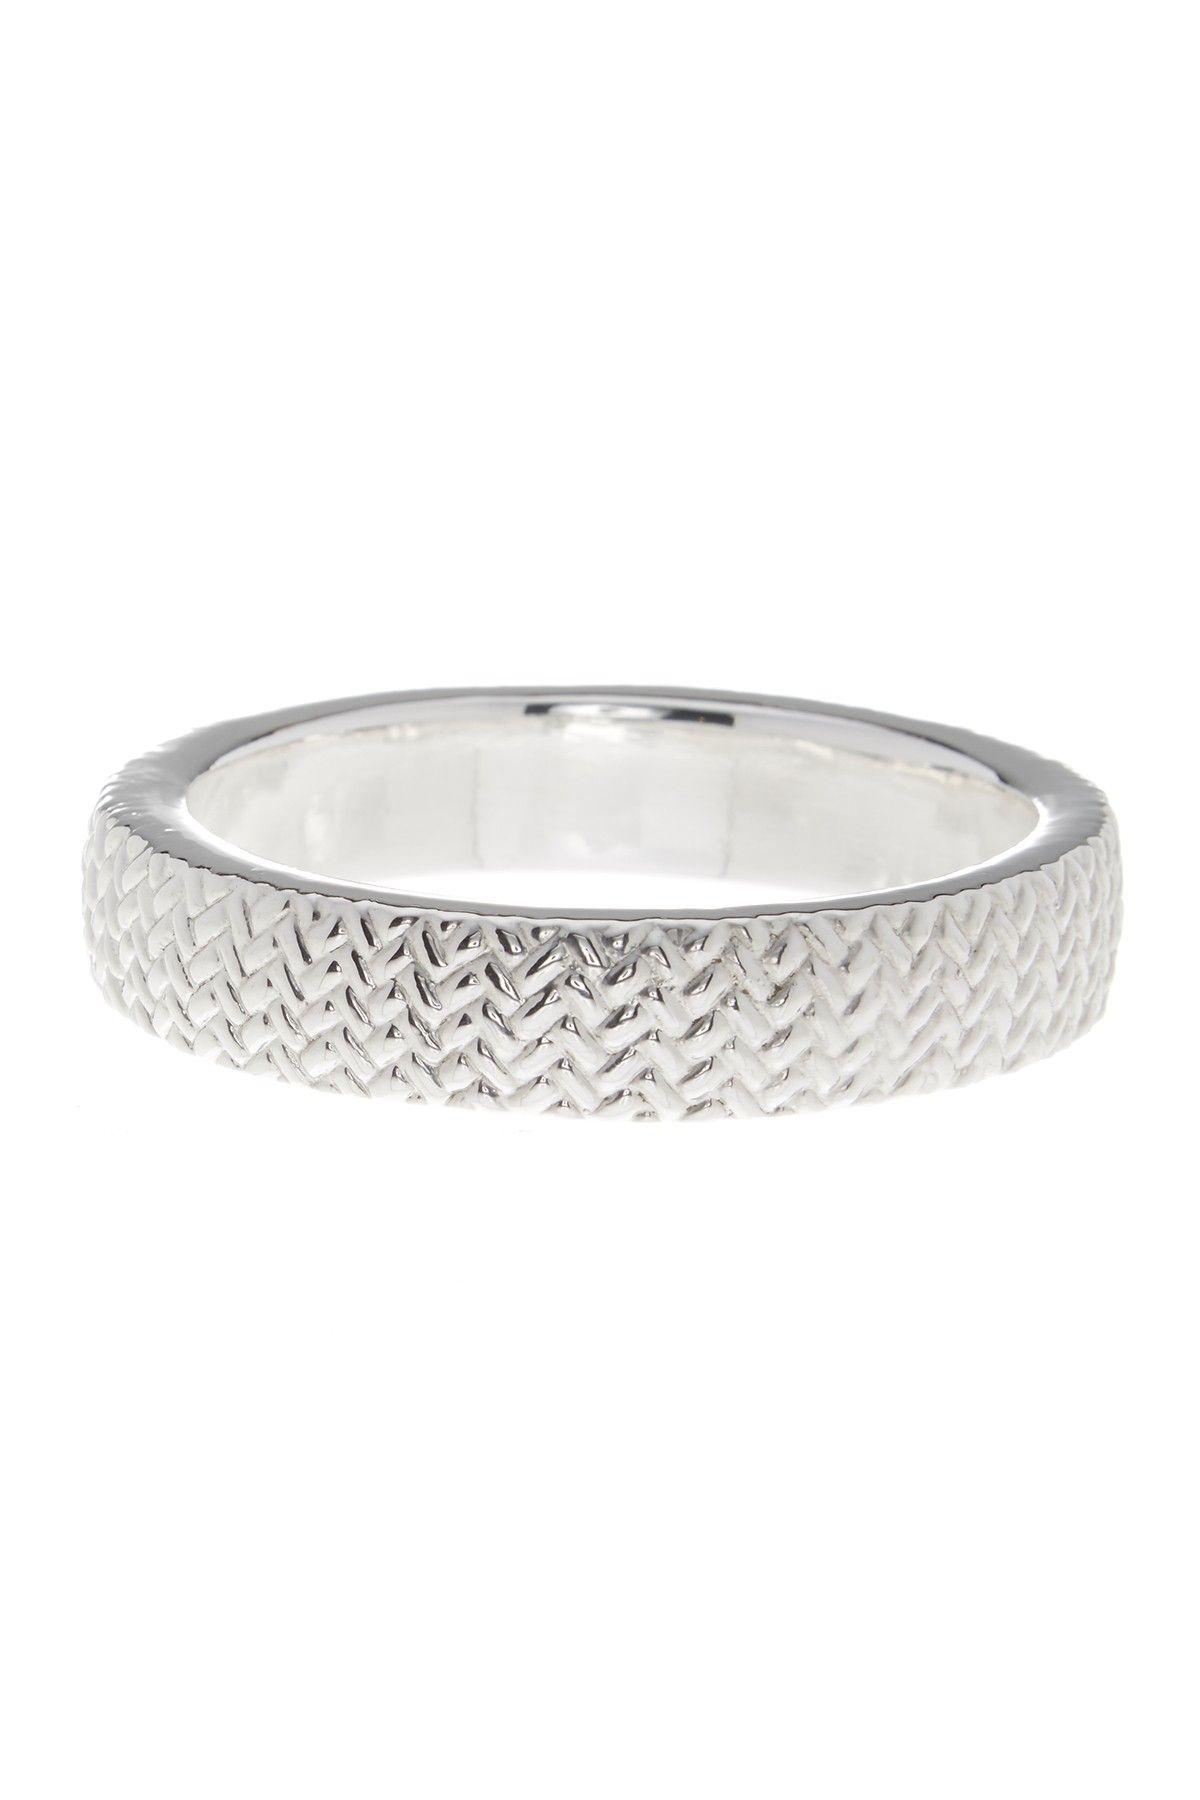 Sterling Silver Textured Medium Bangle